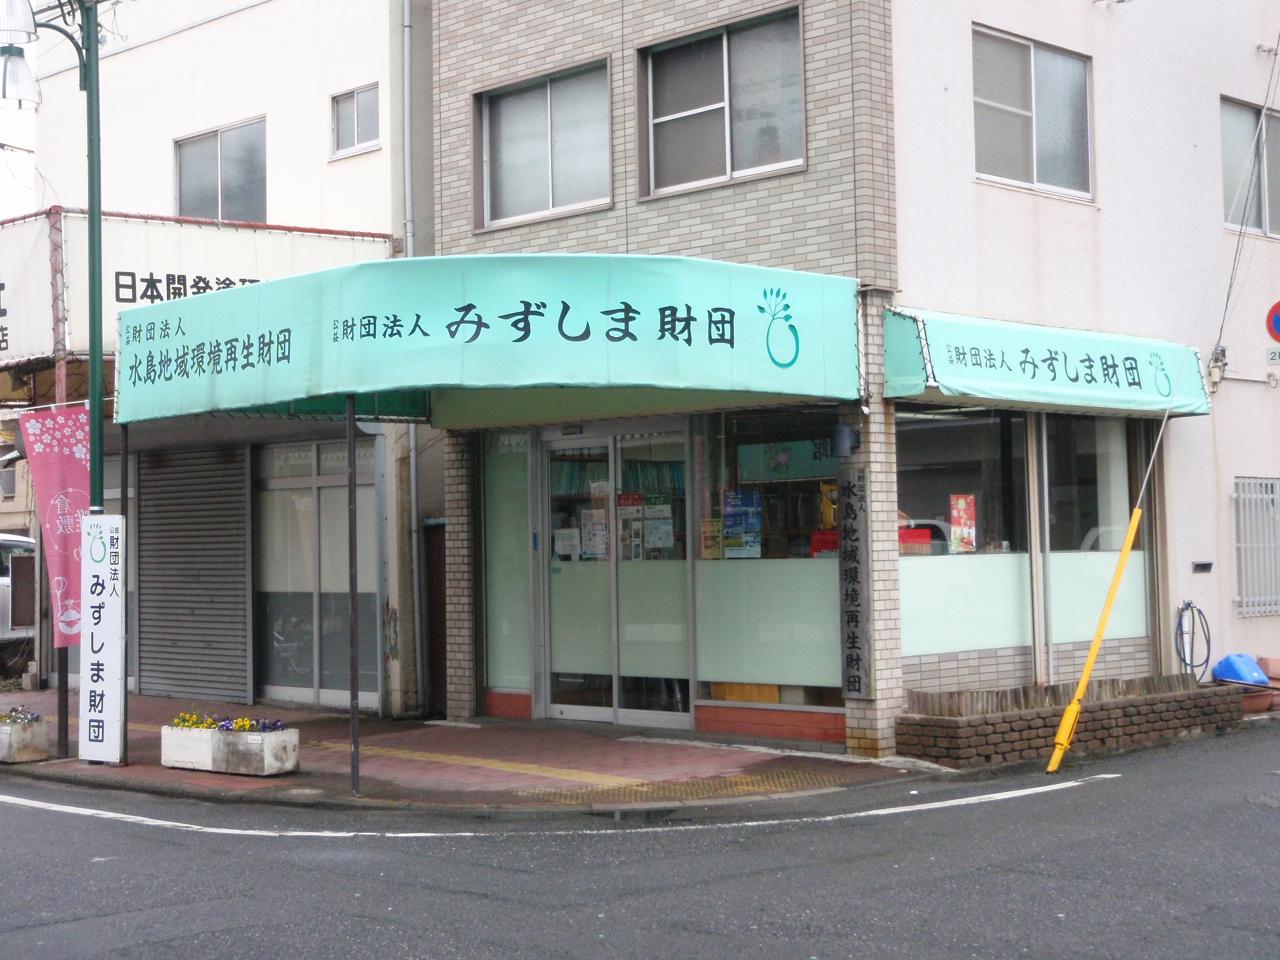 http://esd.mizushima-f.or.jp/pickup/img/P2266298.JPG